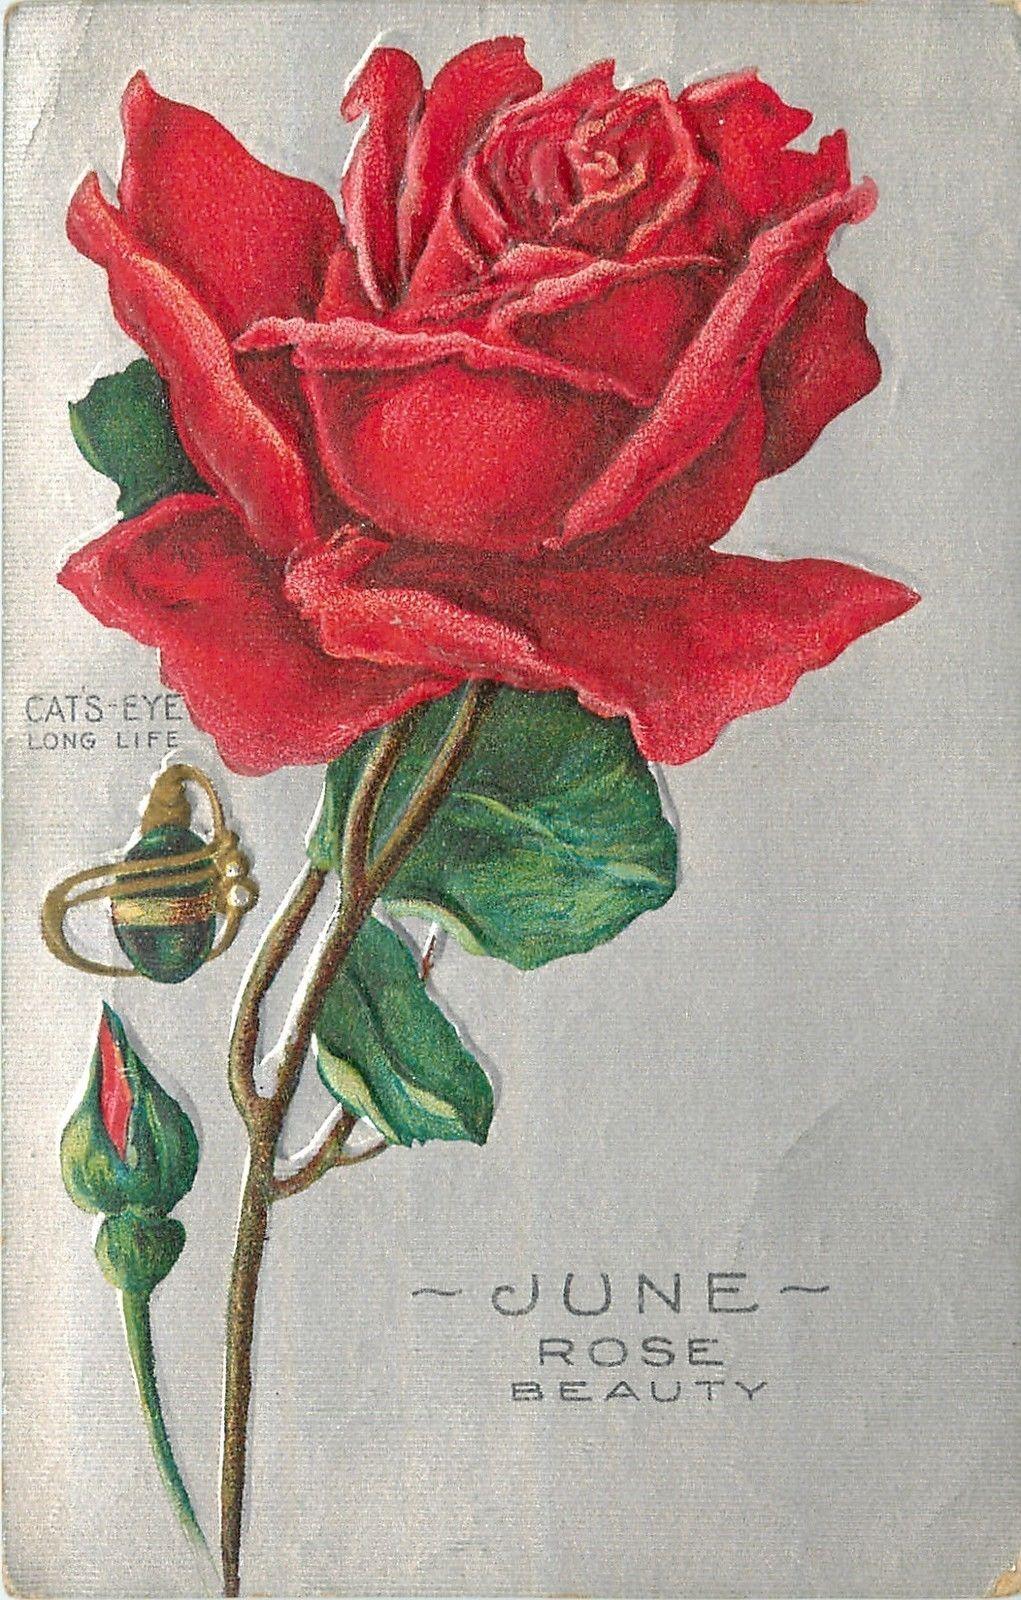 June birthday flowerred rosecats eye pendantsilver textured back collectible greeting postcards ebay izmirmasajfo